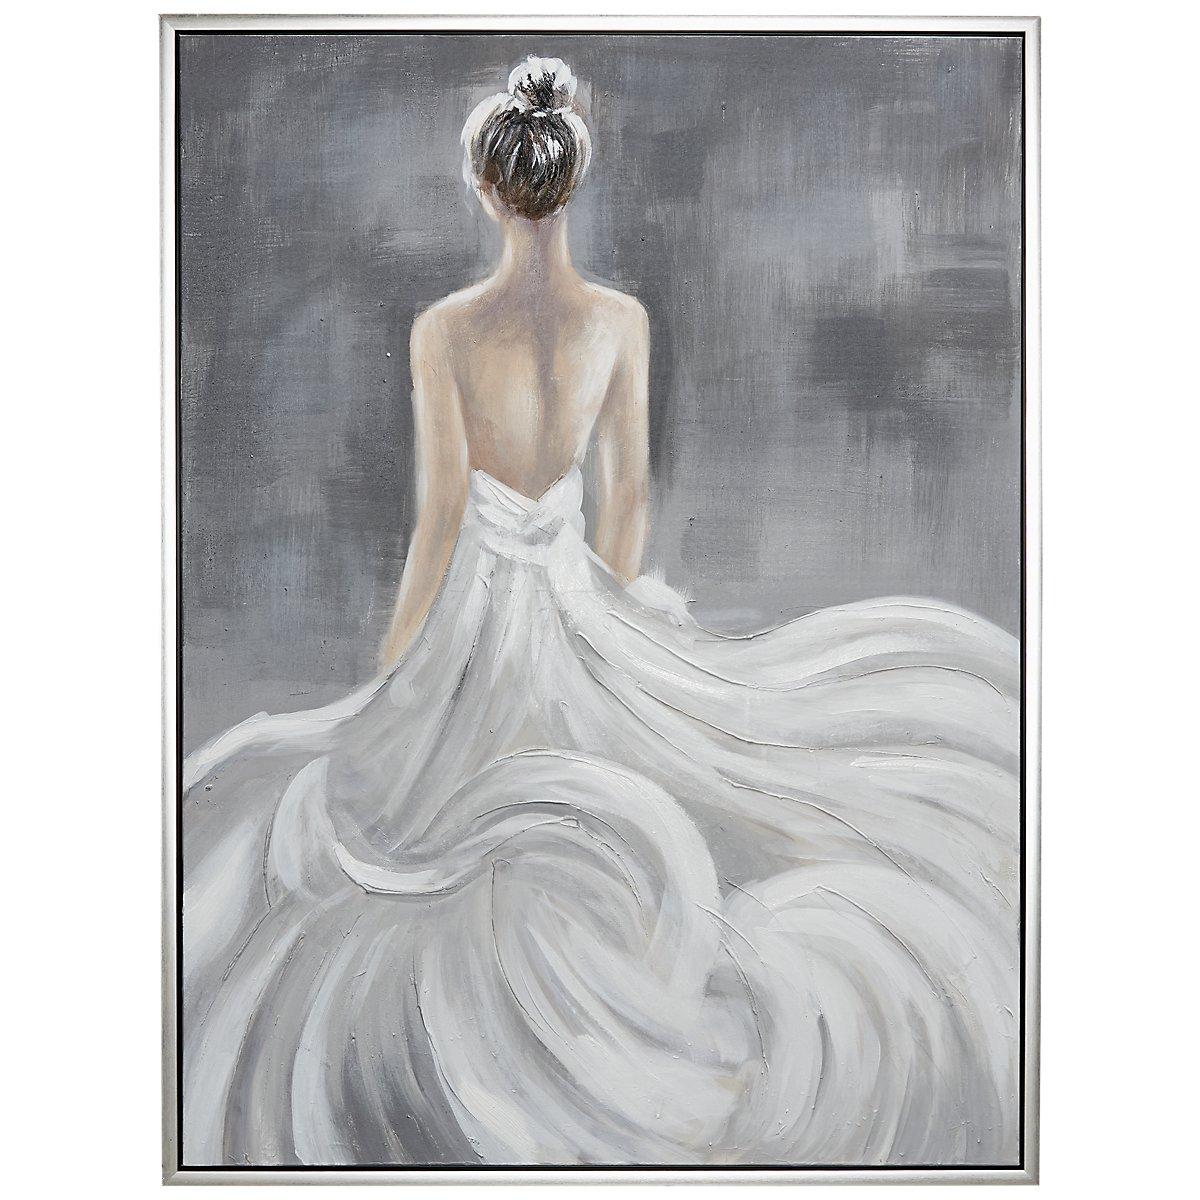 City Furniture: Belle White Framed Canvas